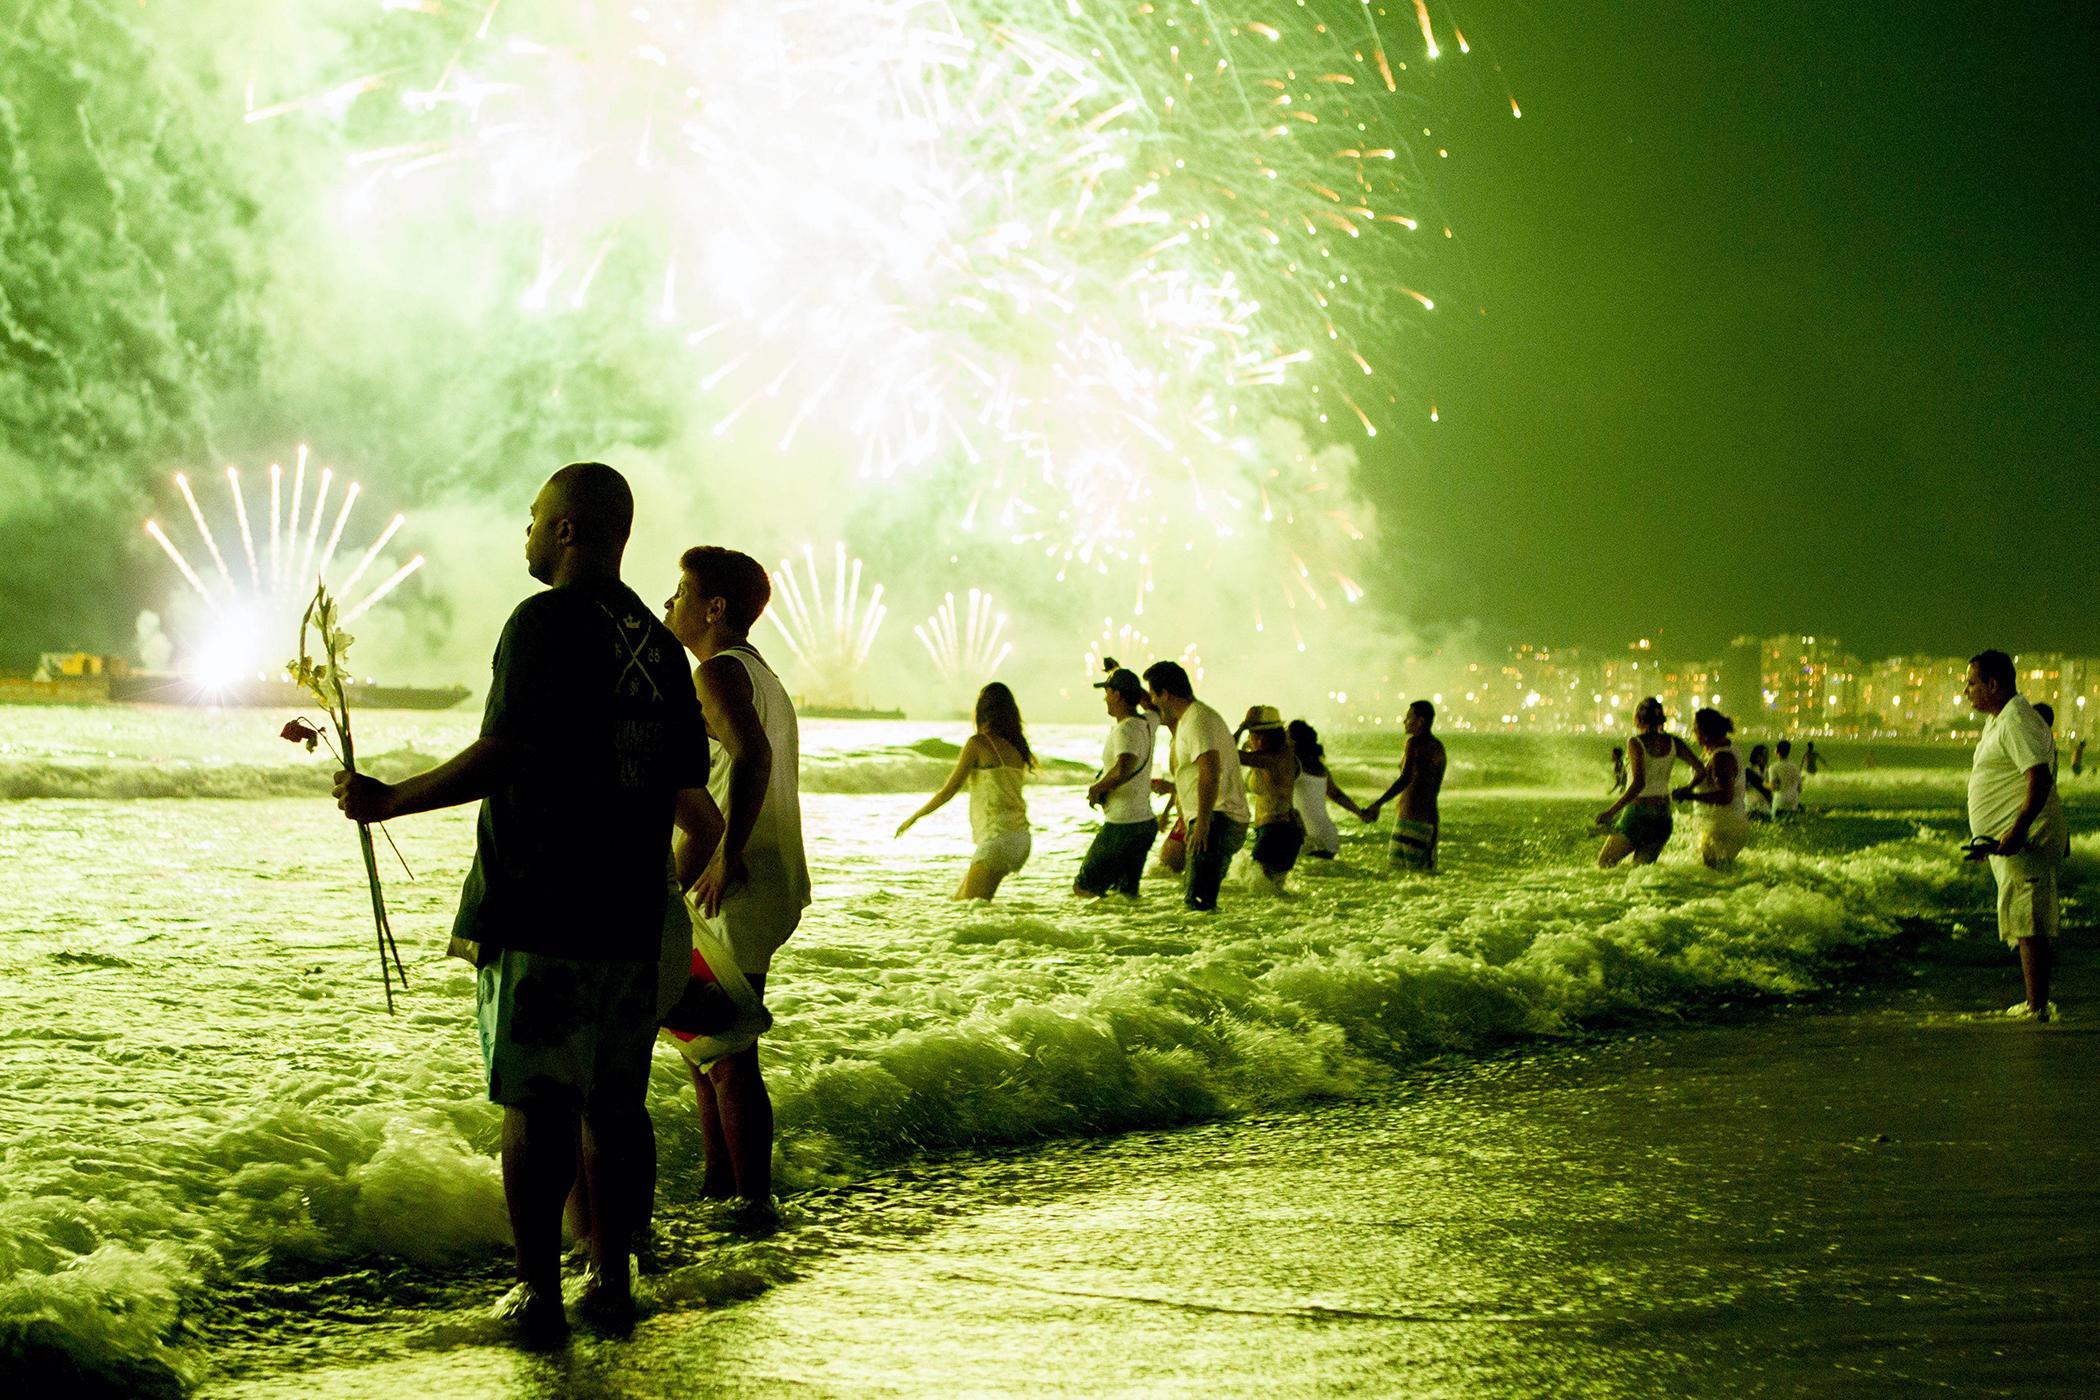 Rio de Janeiro on New Year's Eve